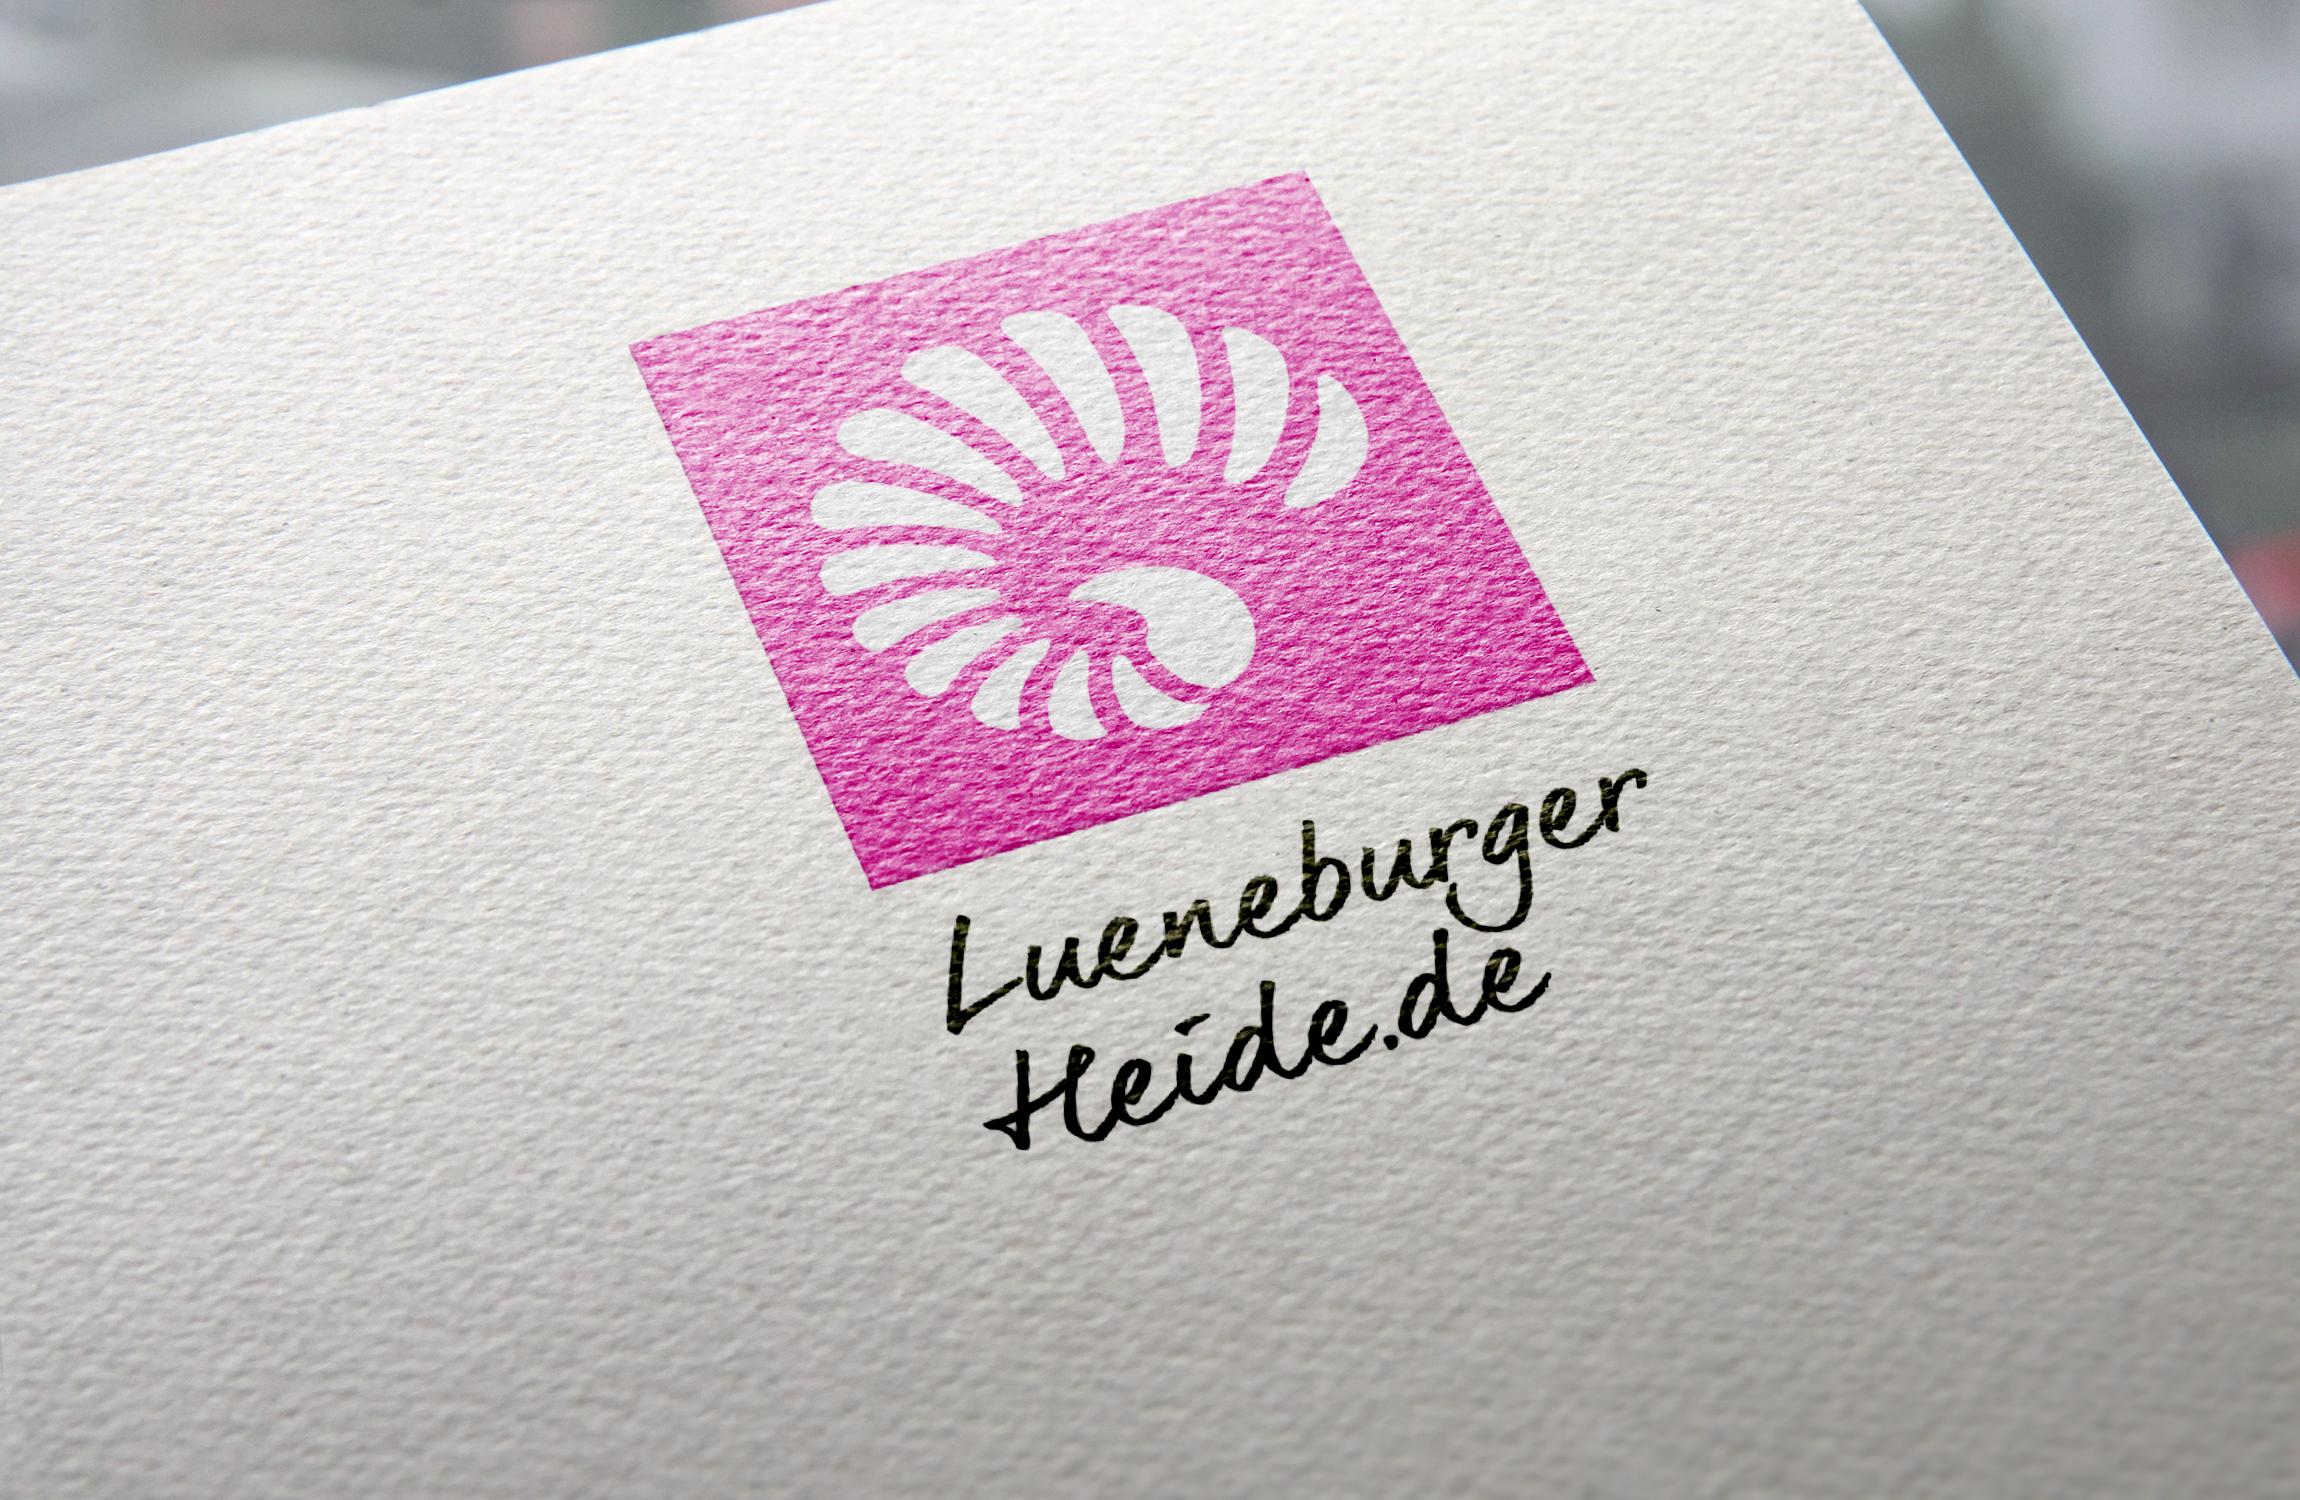 LueneburgerHeide.de